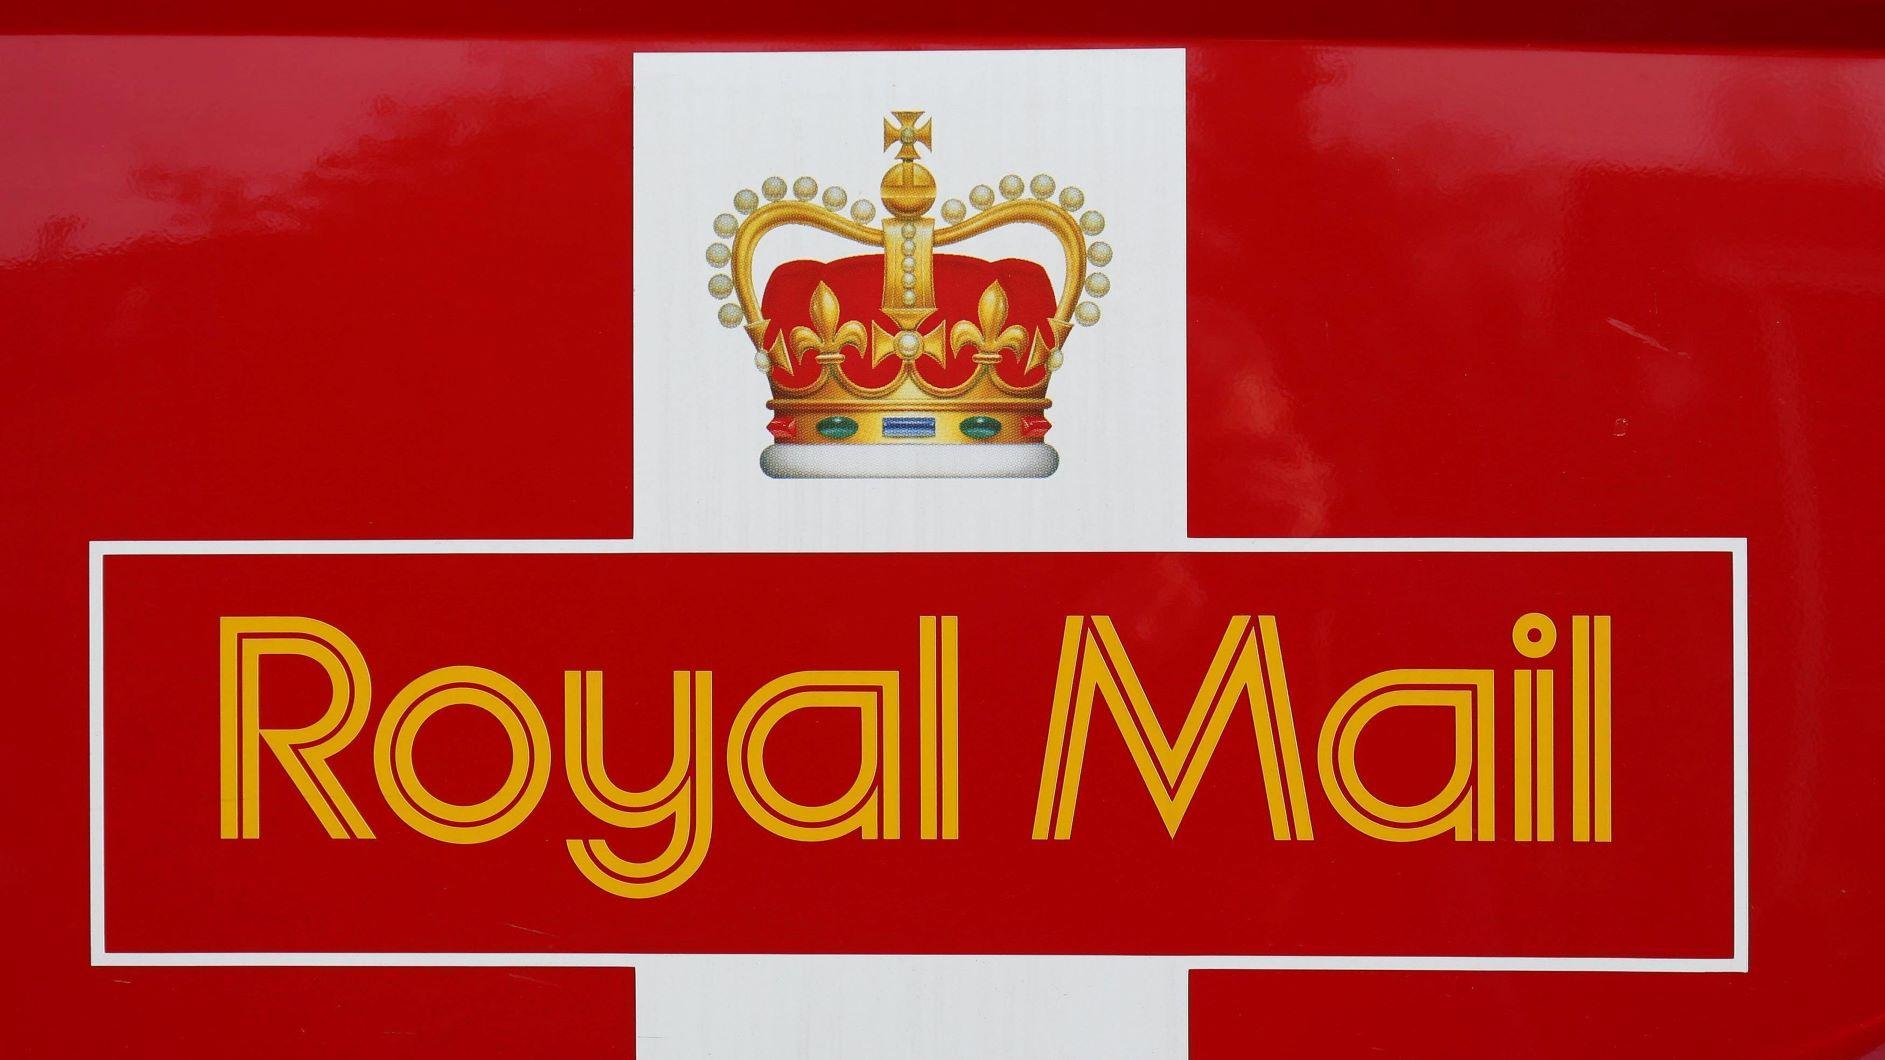 Royal Mail obtém 2.000 empregos de gerenciamento na unidade de corte de custos de coronavírus 4